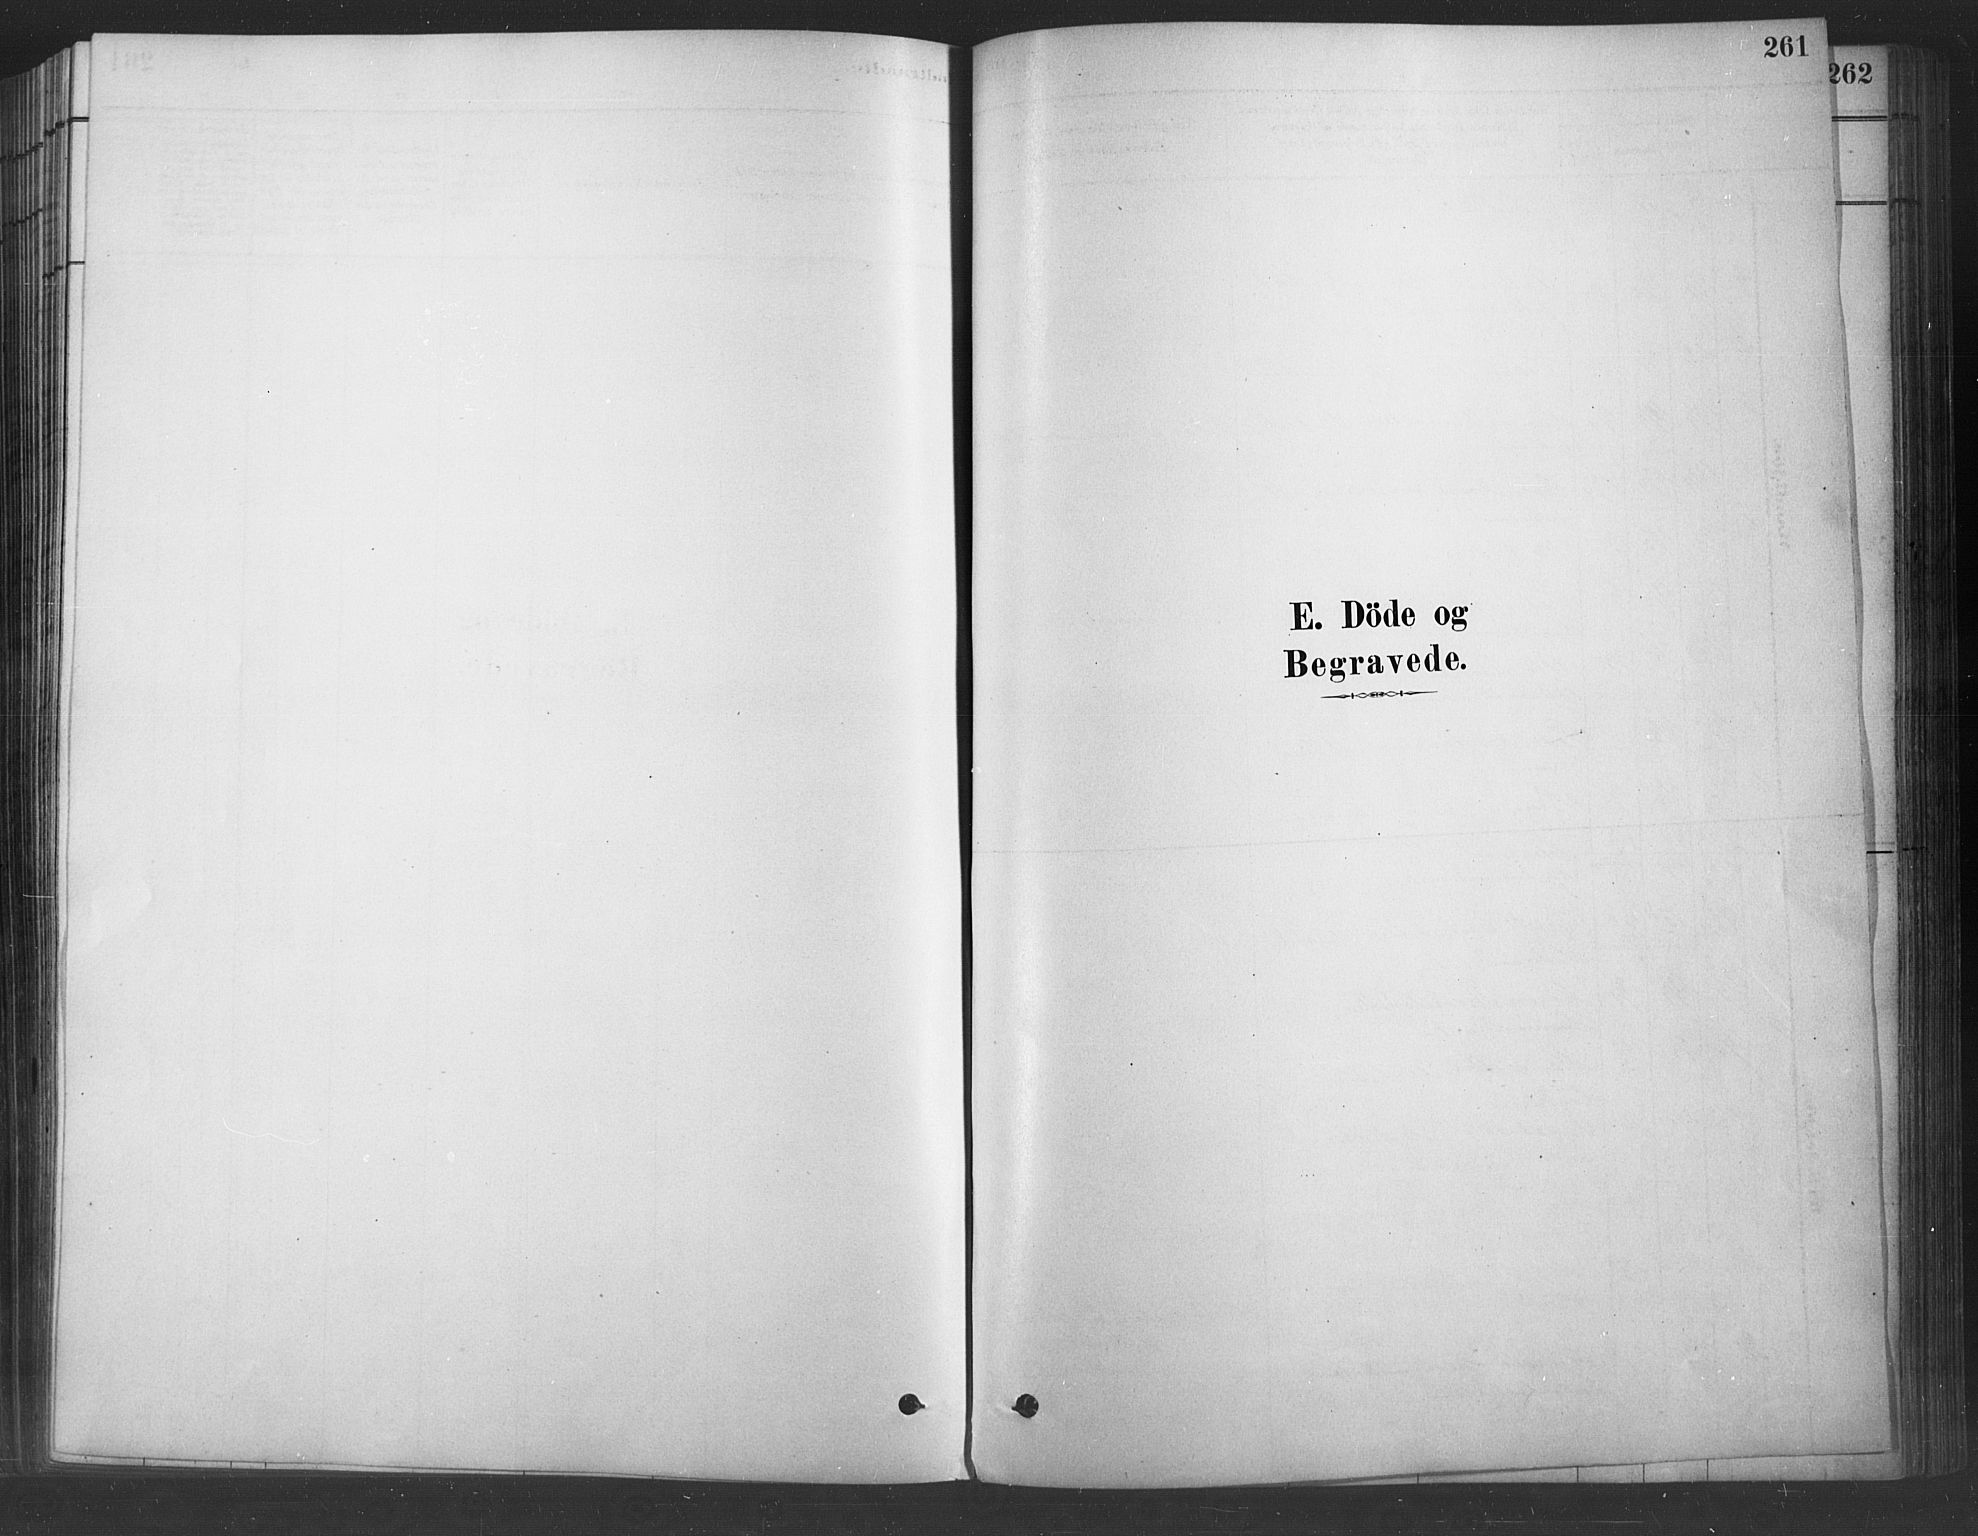 SAH, Fåberg prestekontor, Ministerialbok nr. 9, 1879-1898, s. 261